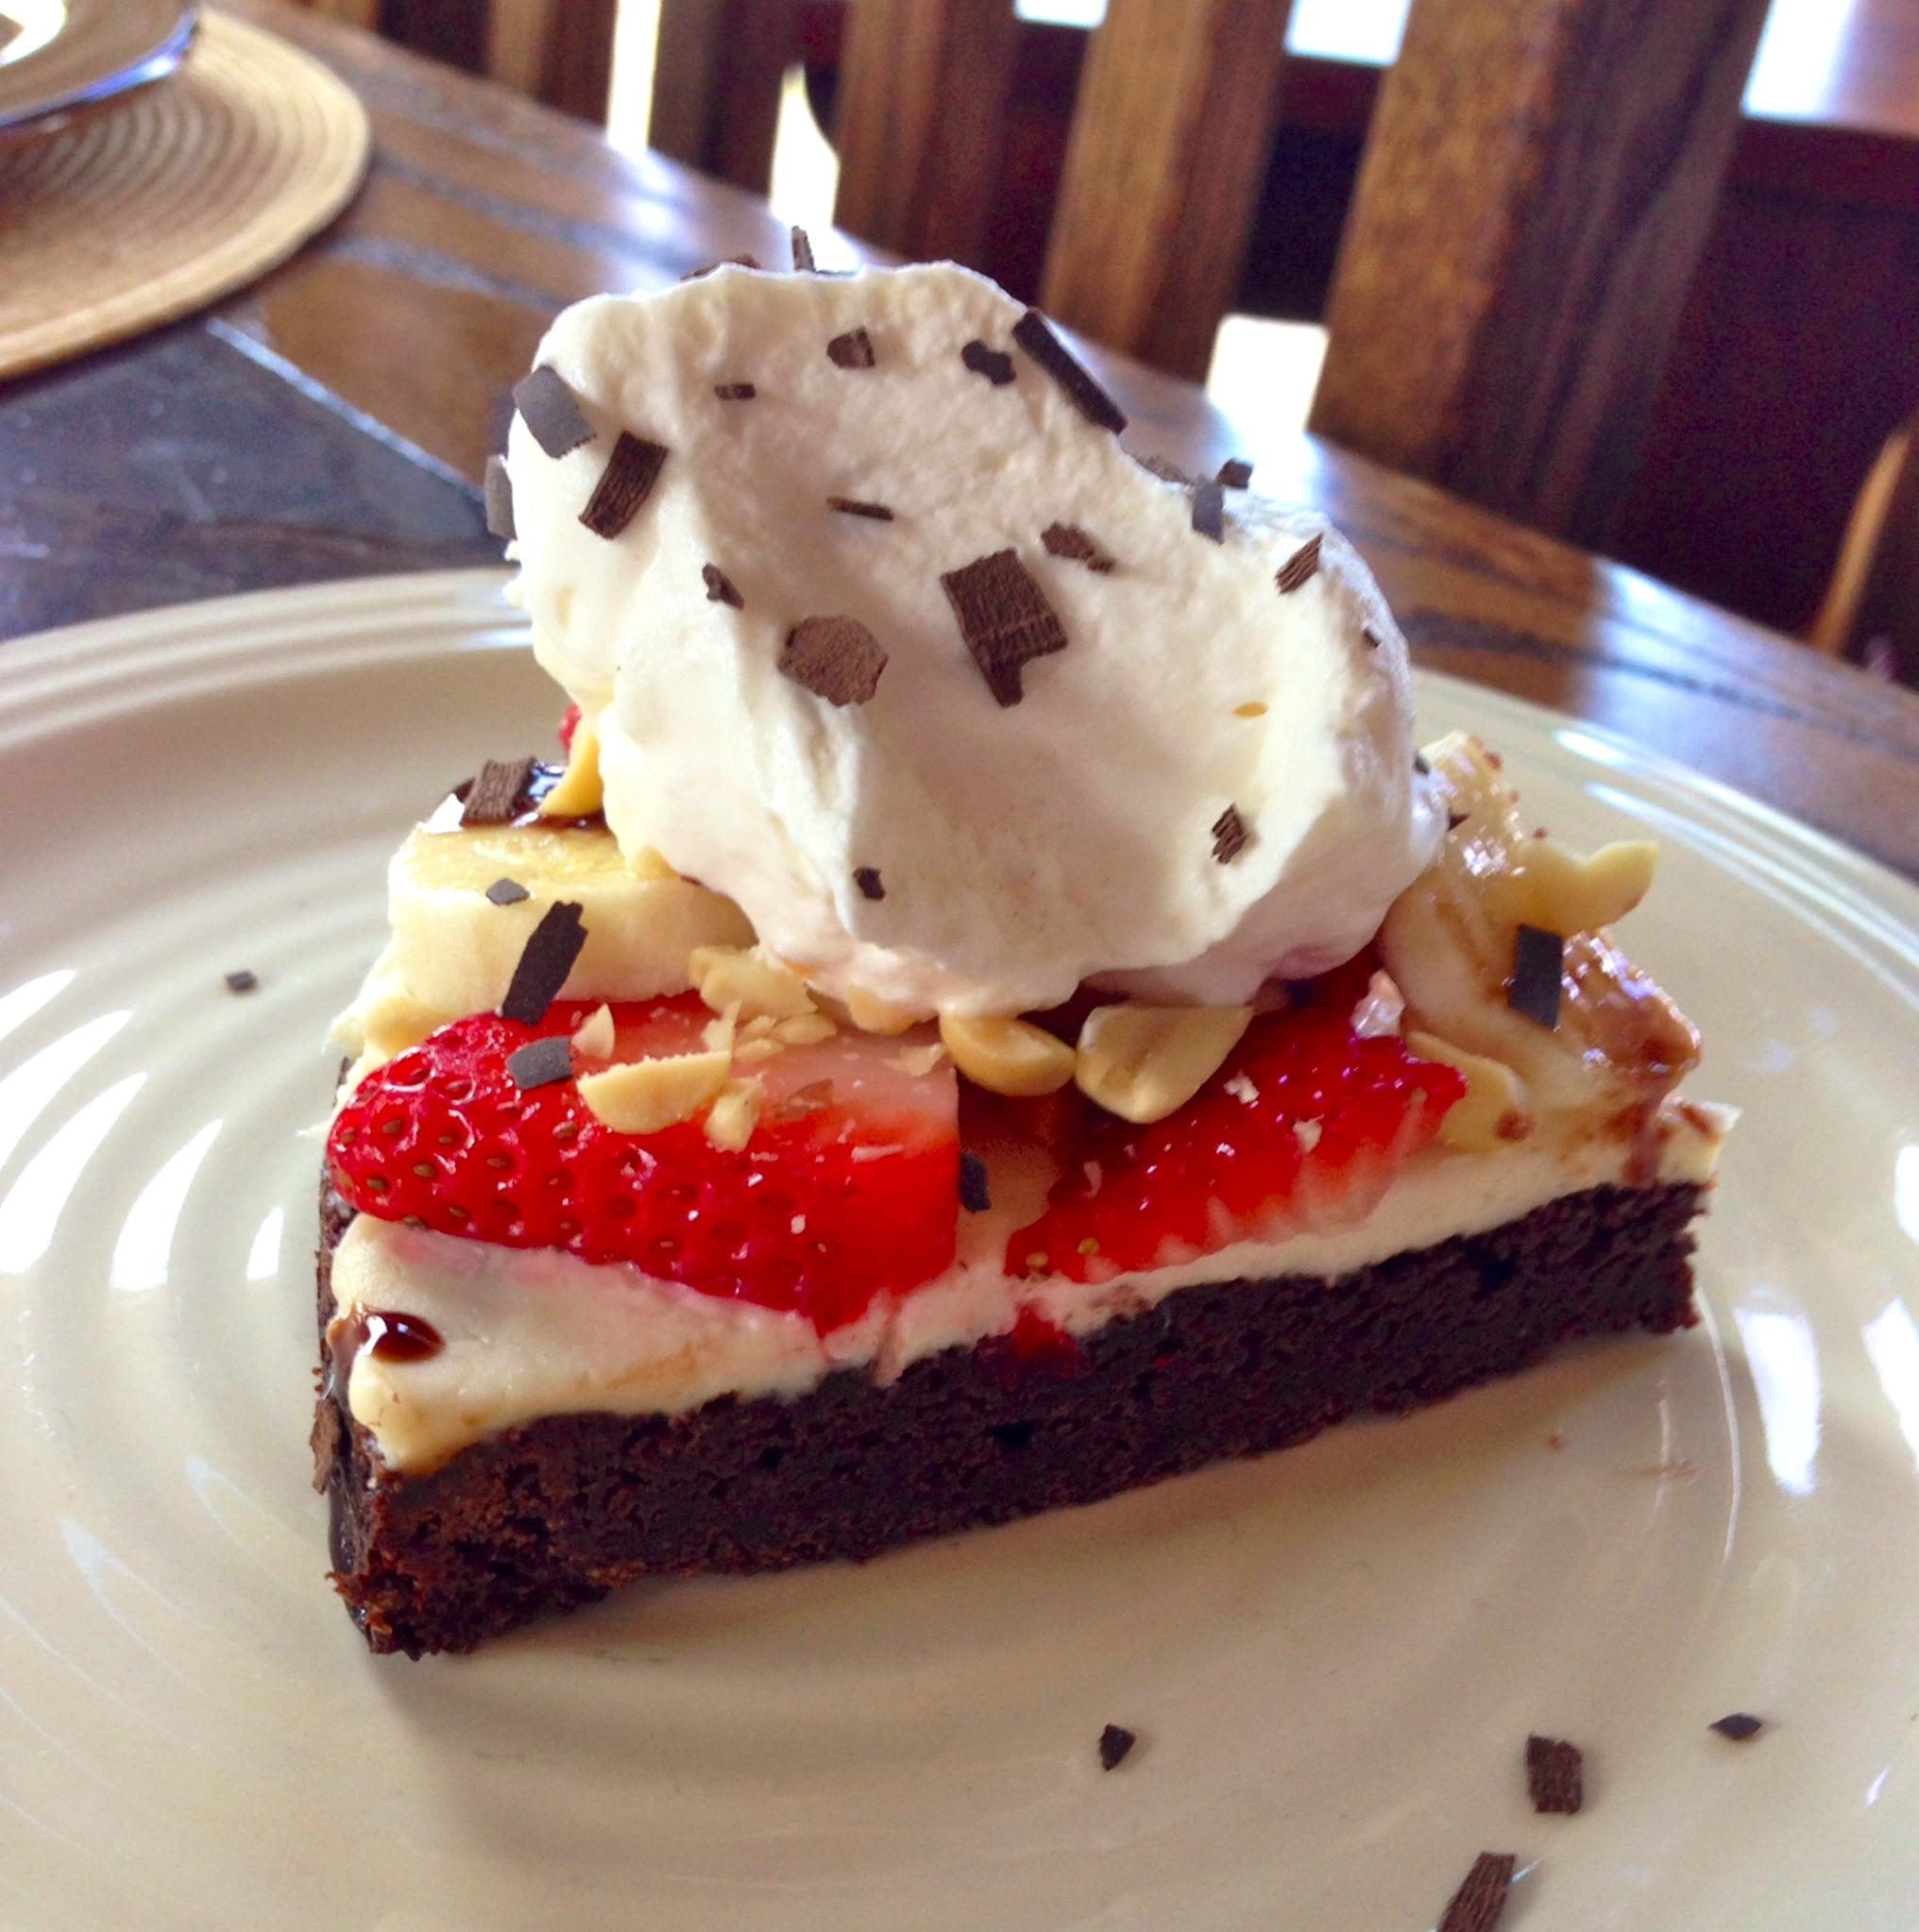 Chocoholic: No Bake Crispy Corn Flake Chocolate Peanut